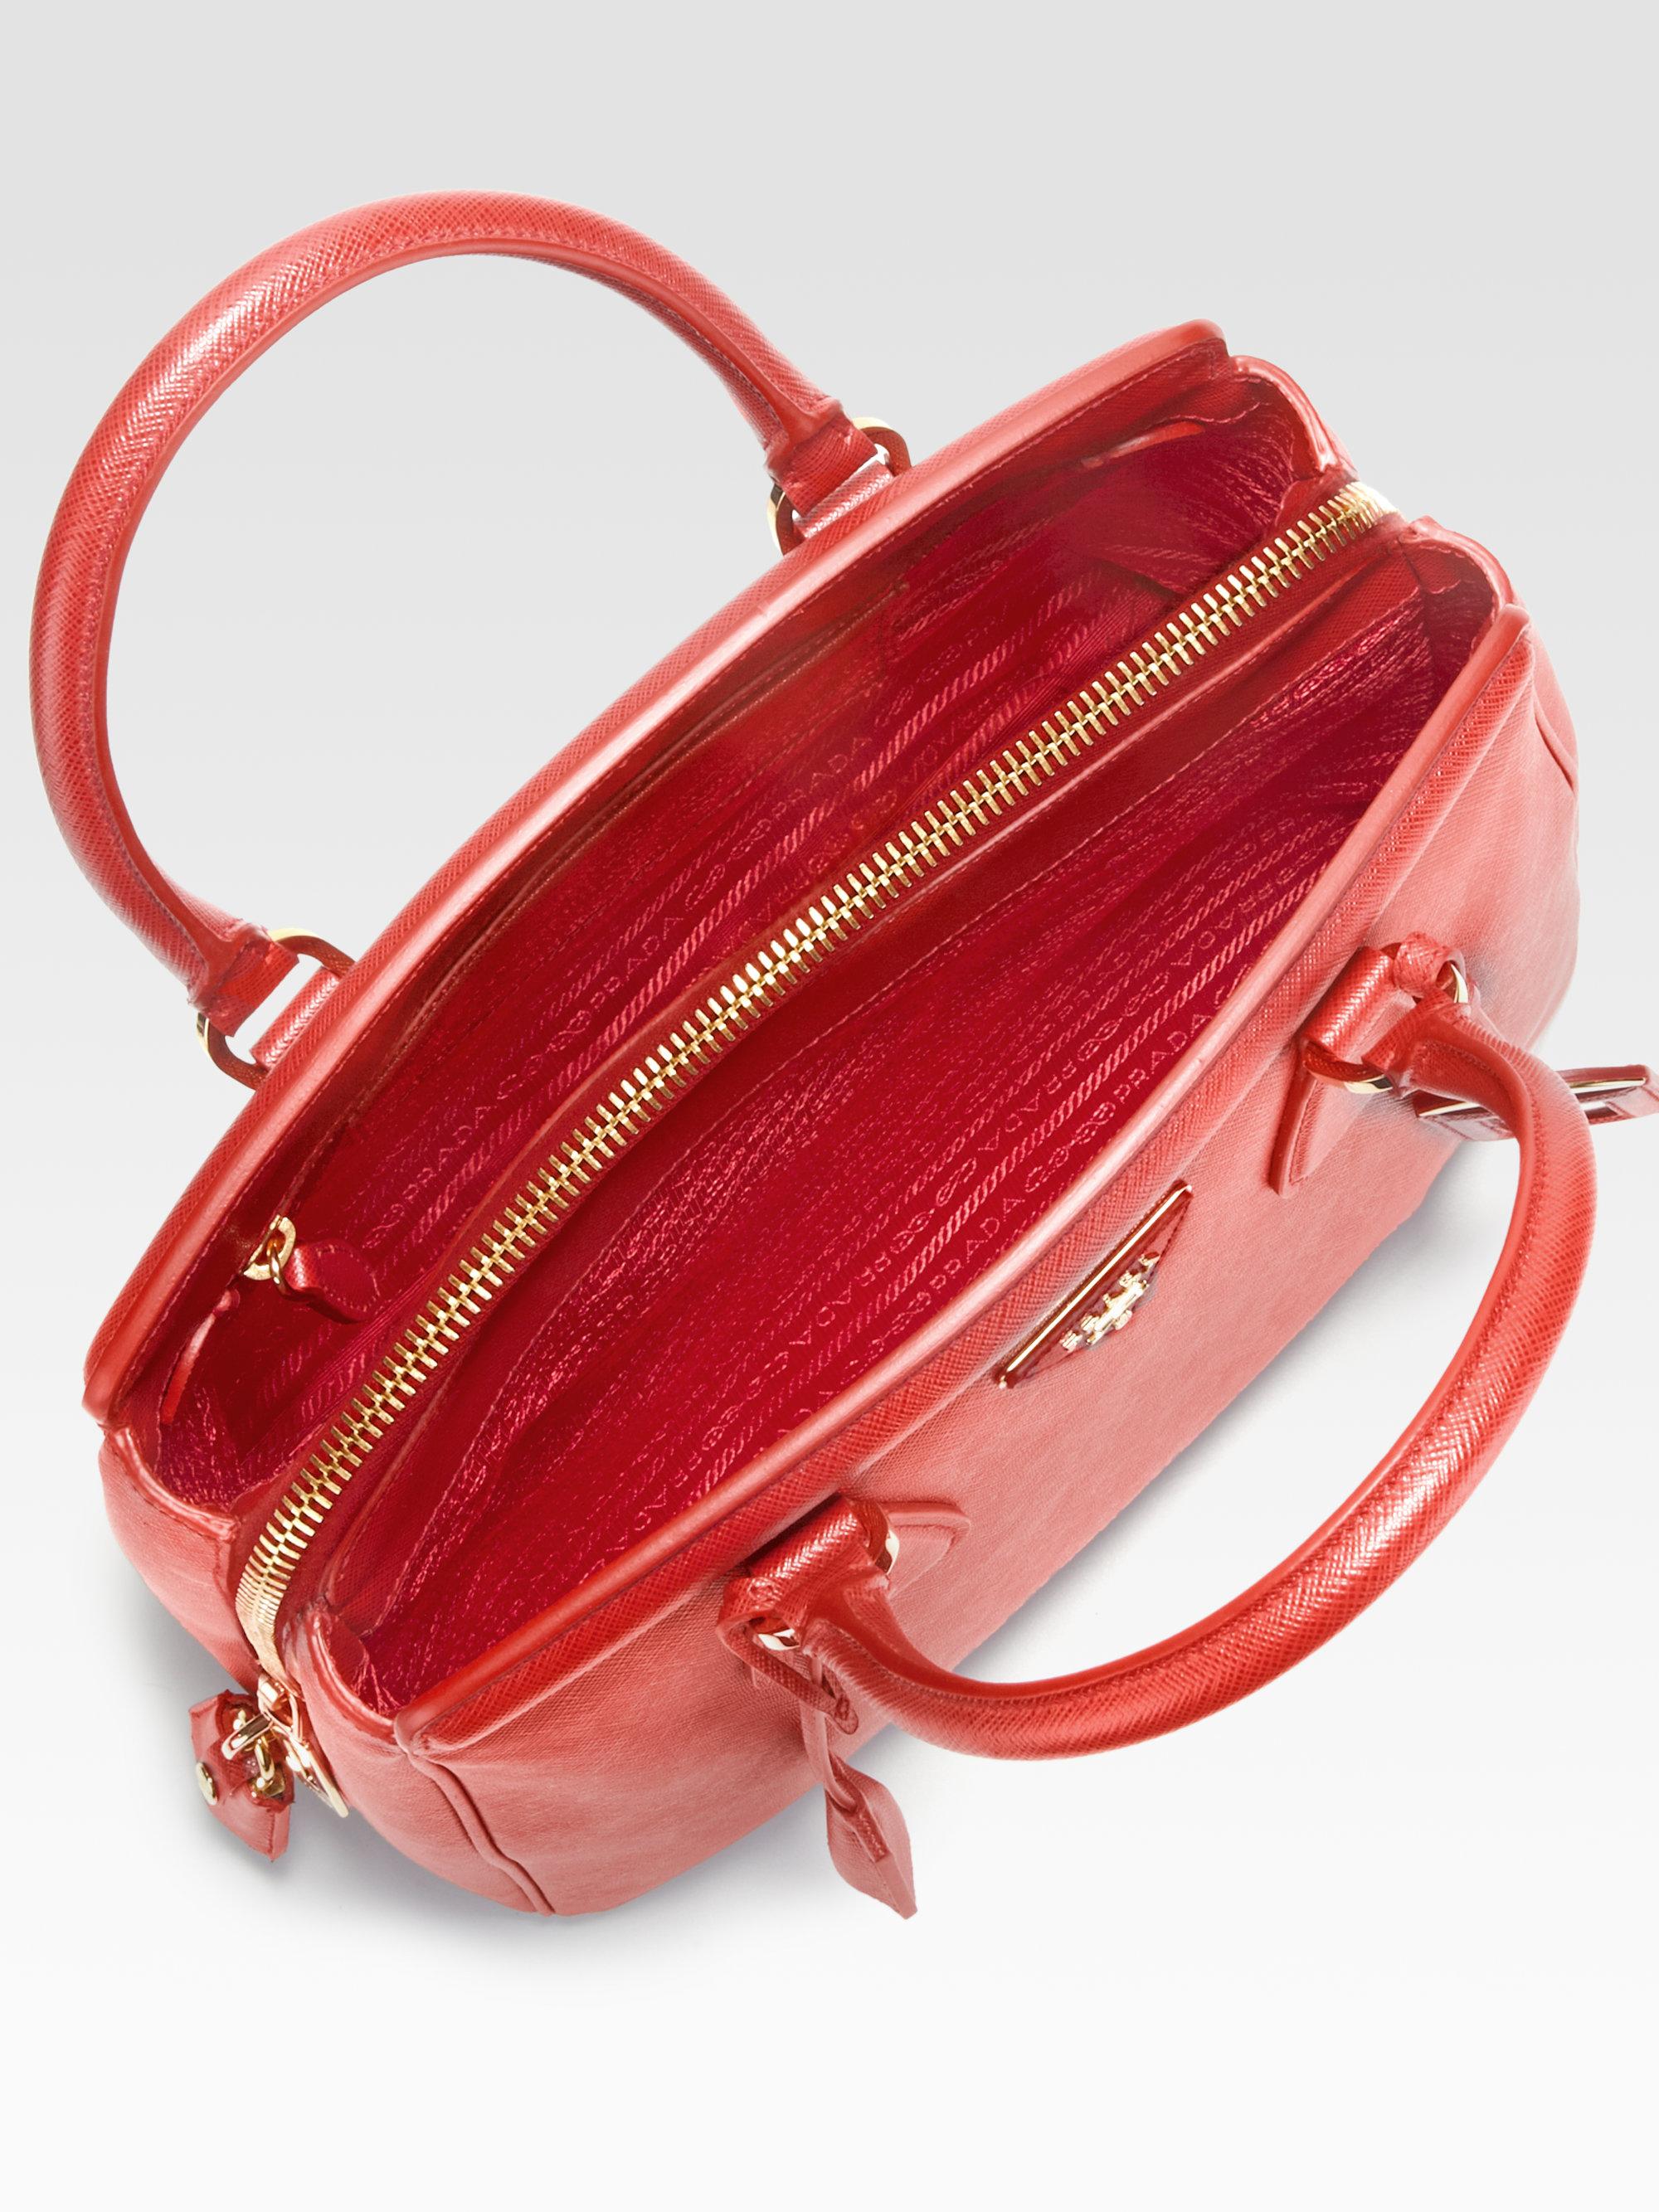 Prada Saffiano Zip Promenade Top Handle Bag in Red (fuoco-red)   Lyst